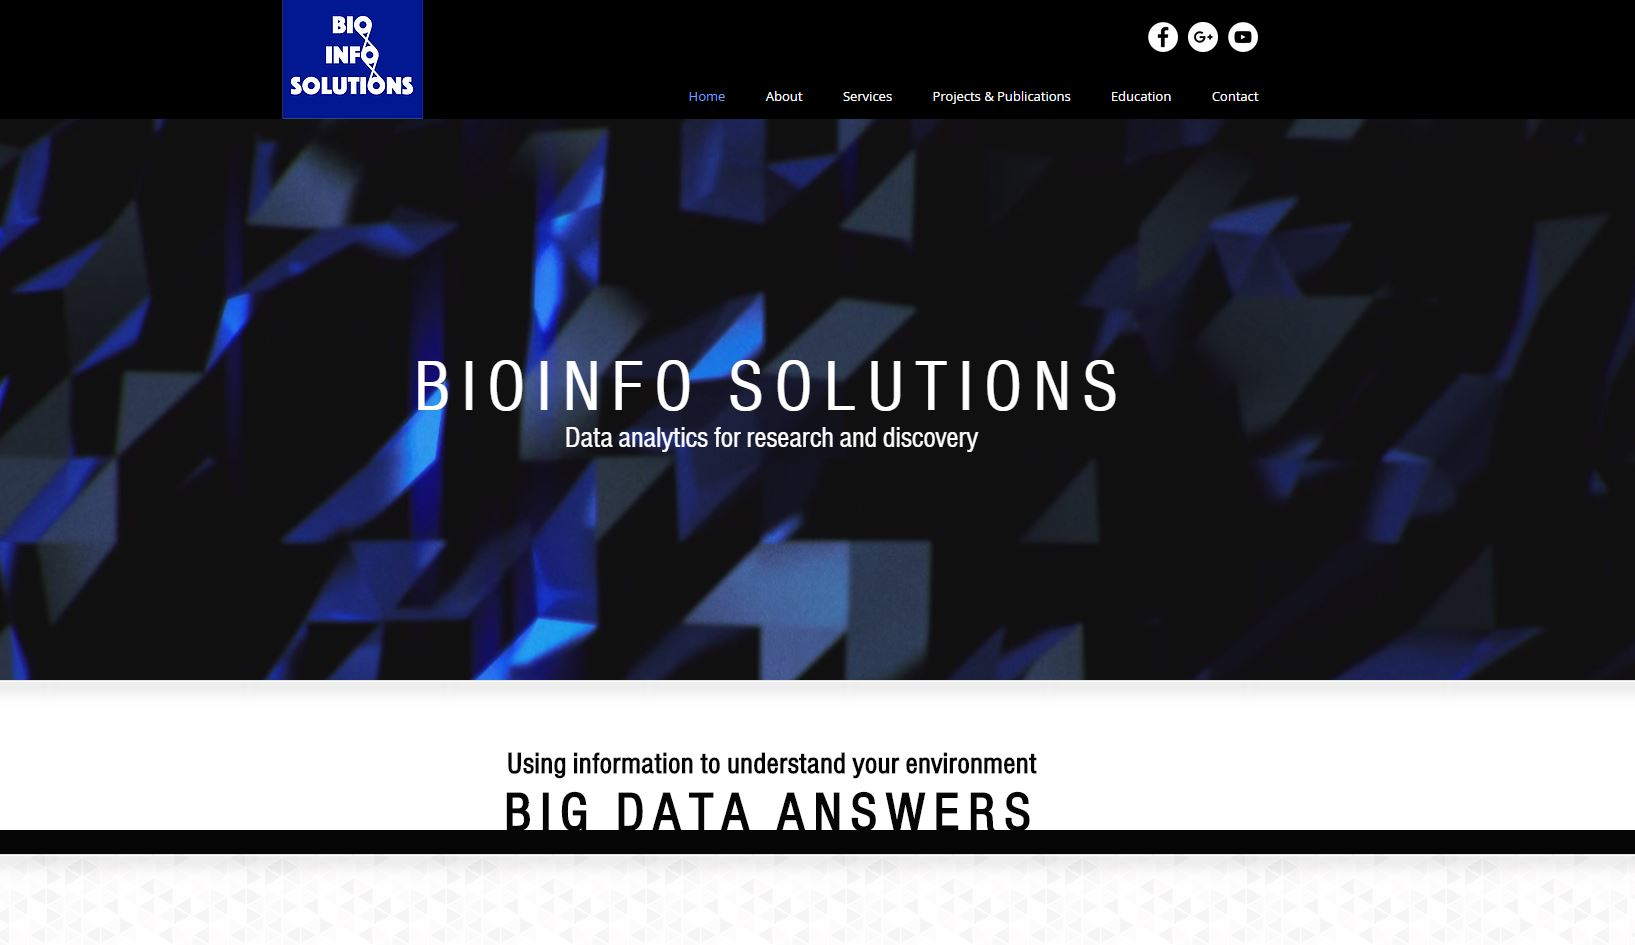 Bioinfo Solutions